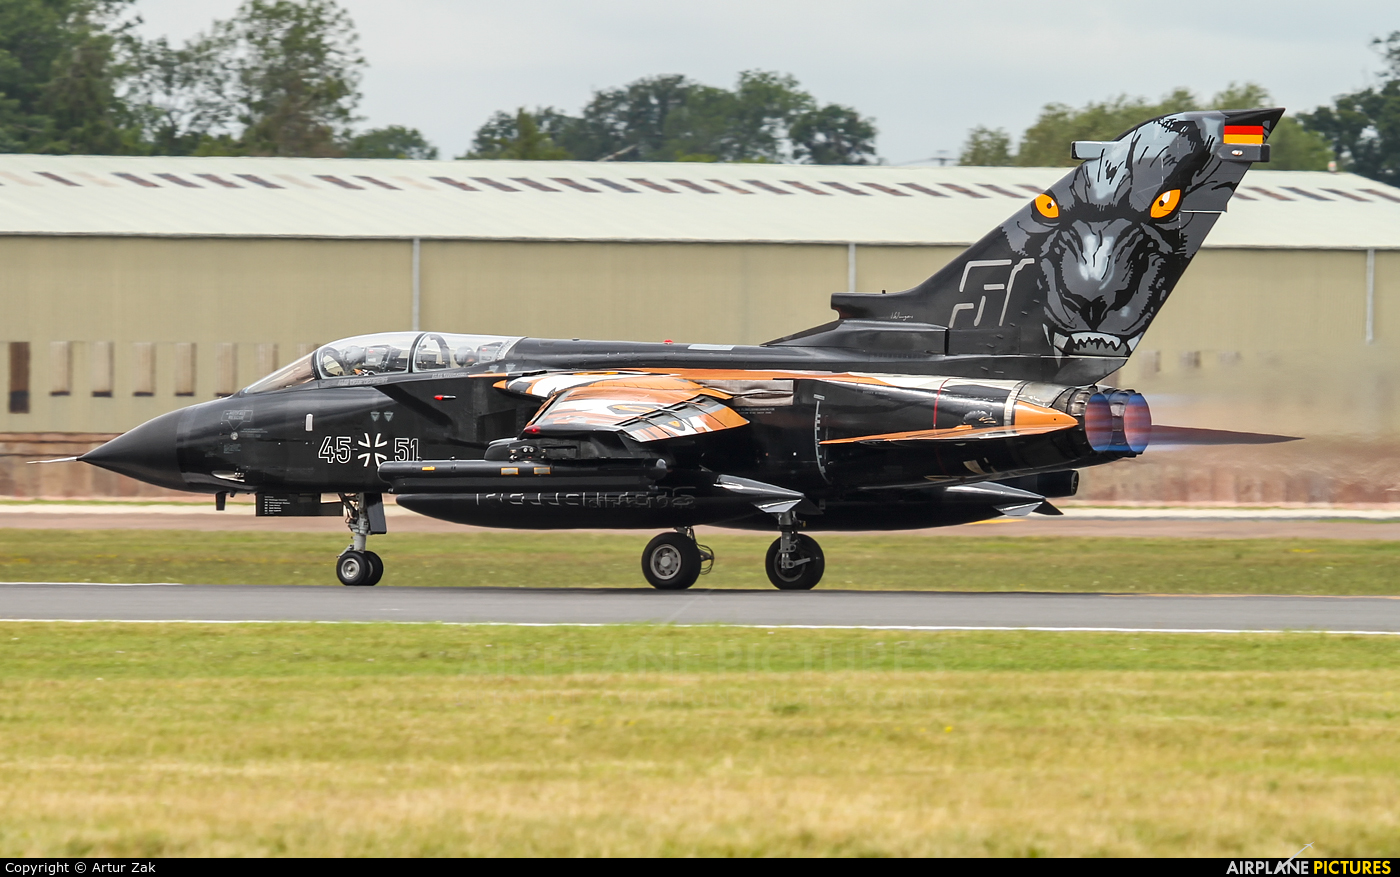 Germany - Air Force 45+51 aircraft at Fairford